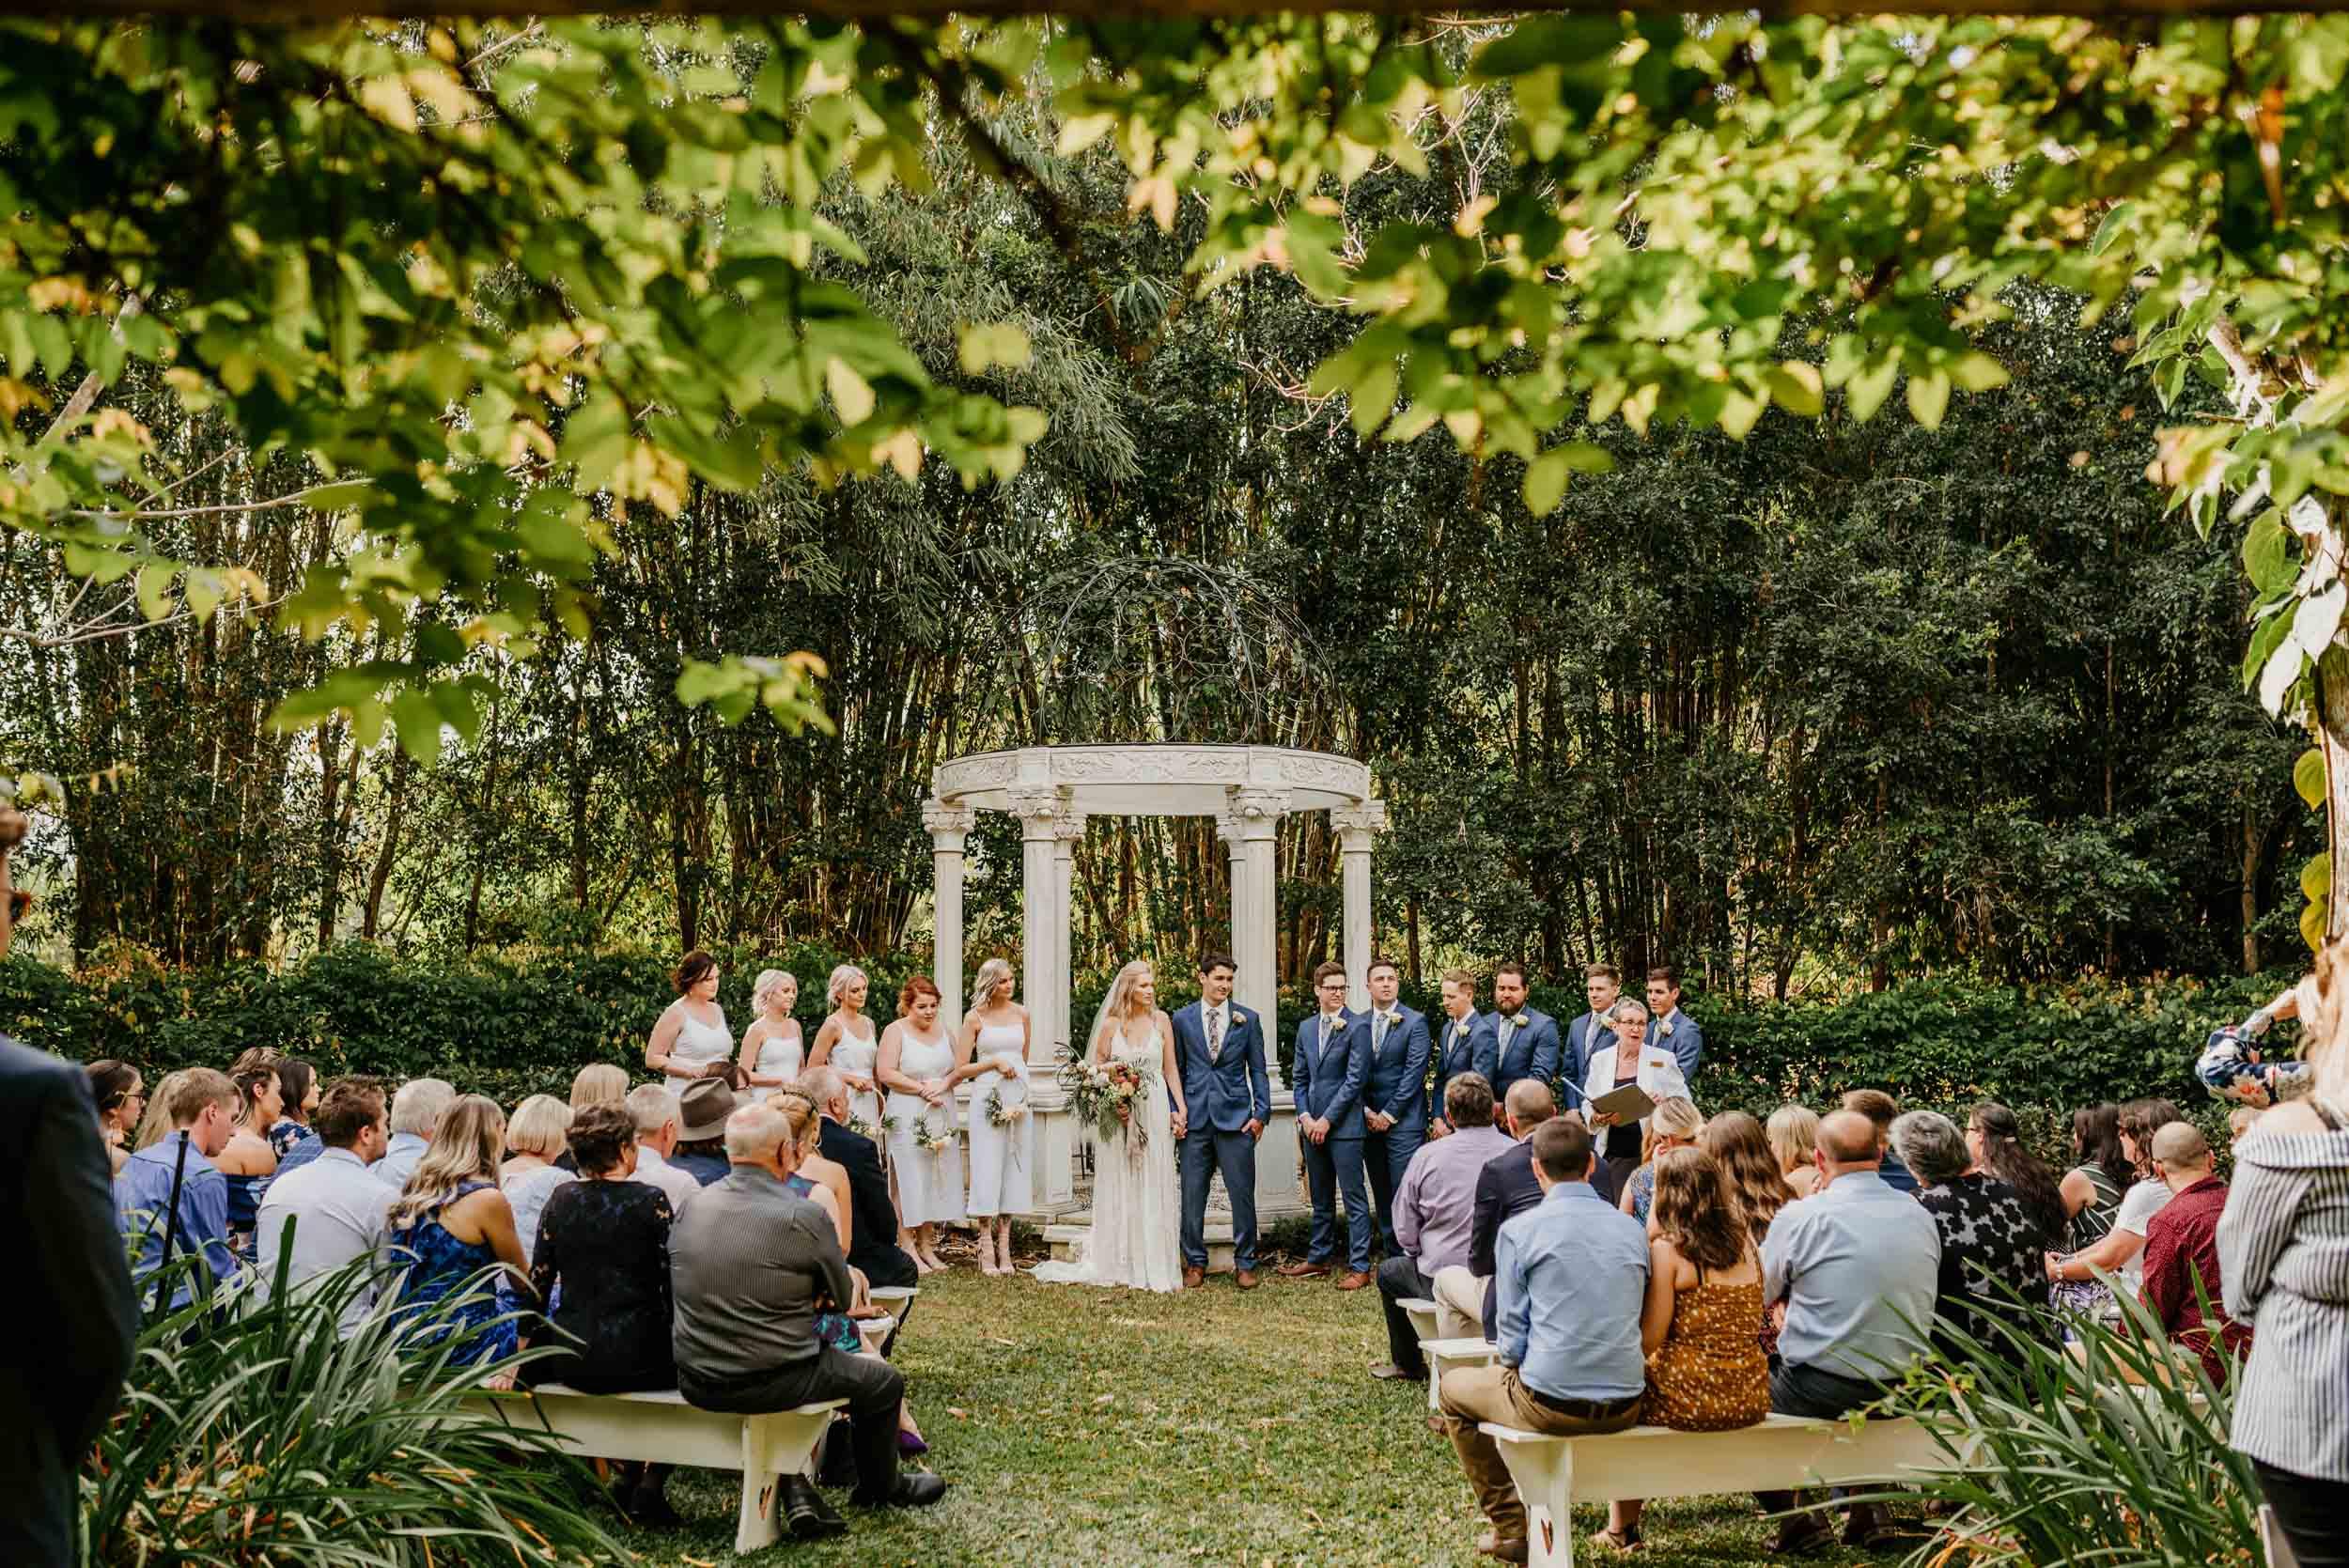 The Raw Photographer - Cairns Wedding Photographer - Laloli - Cairns Garden Wedding - Wedding Dress-36.jpg